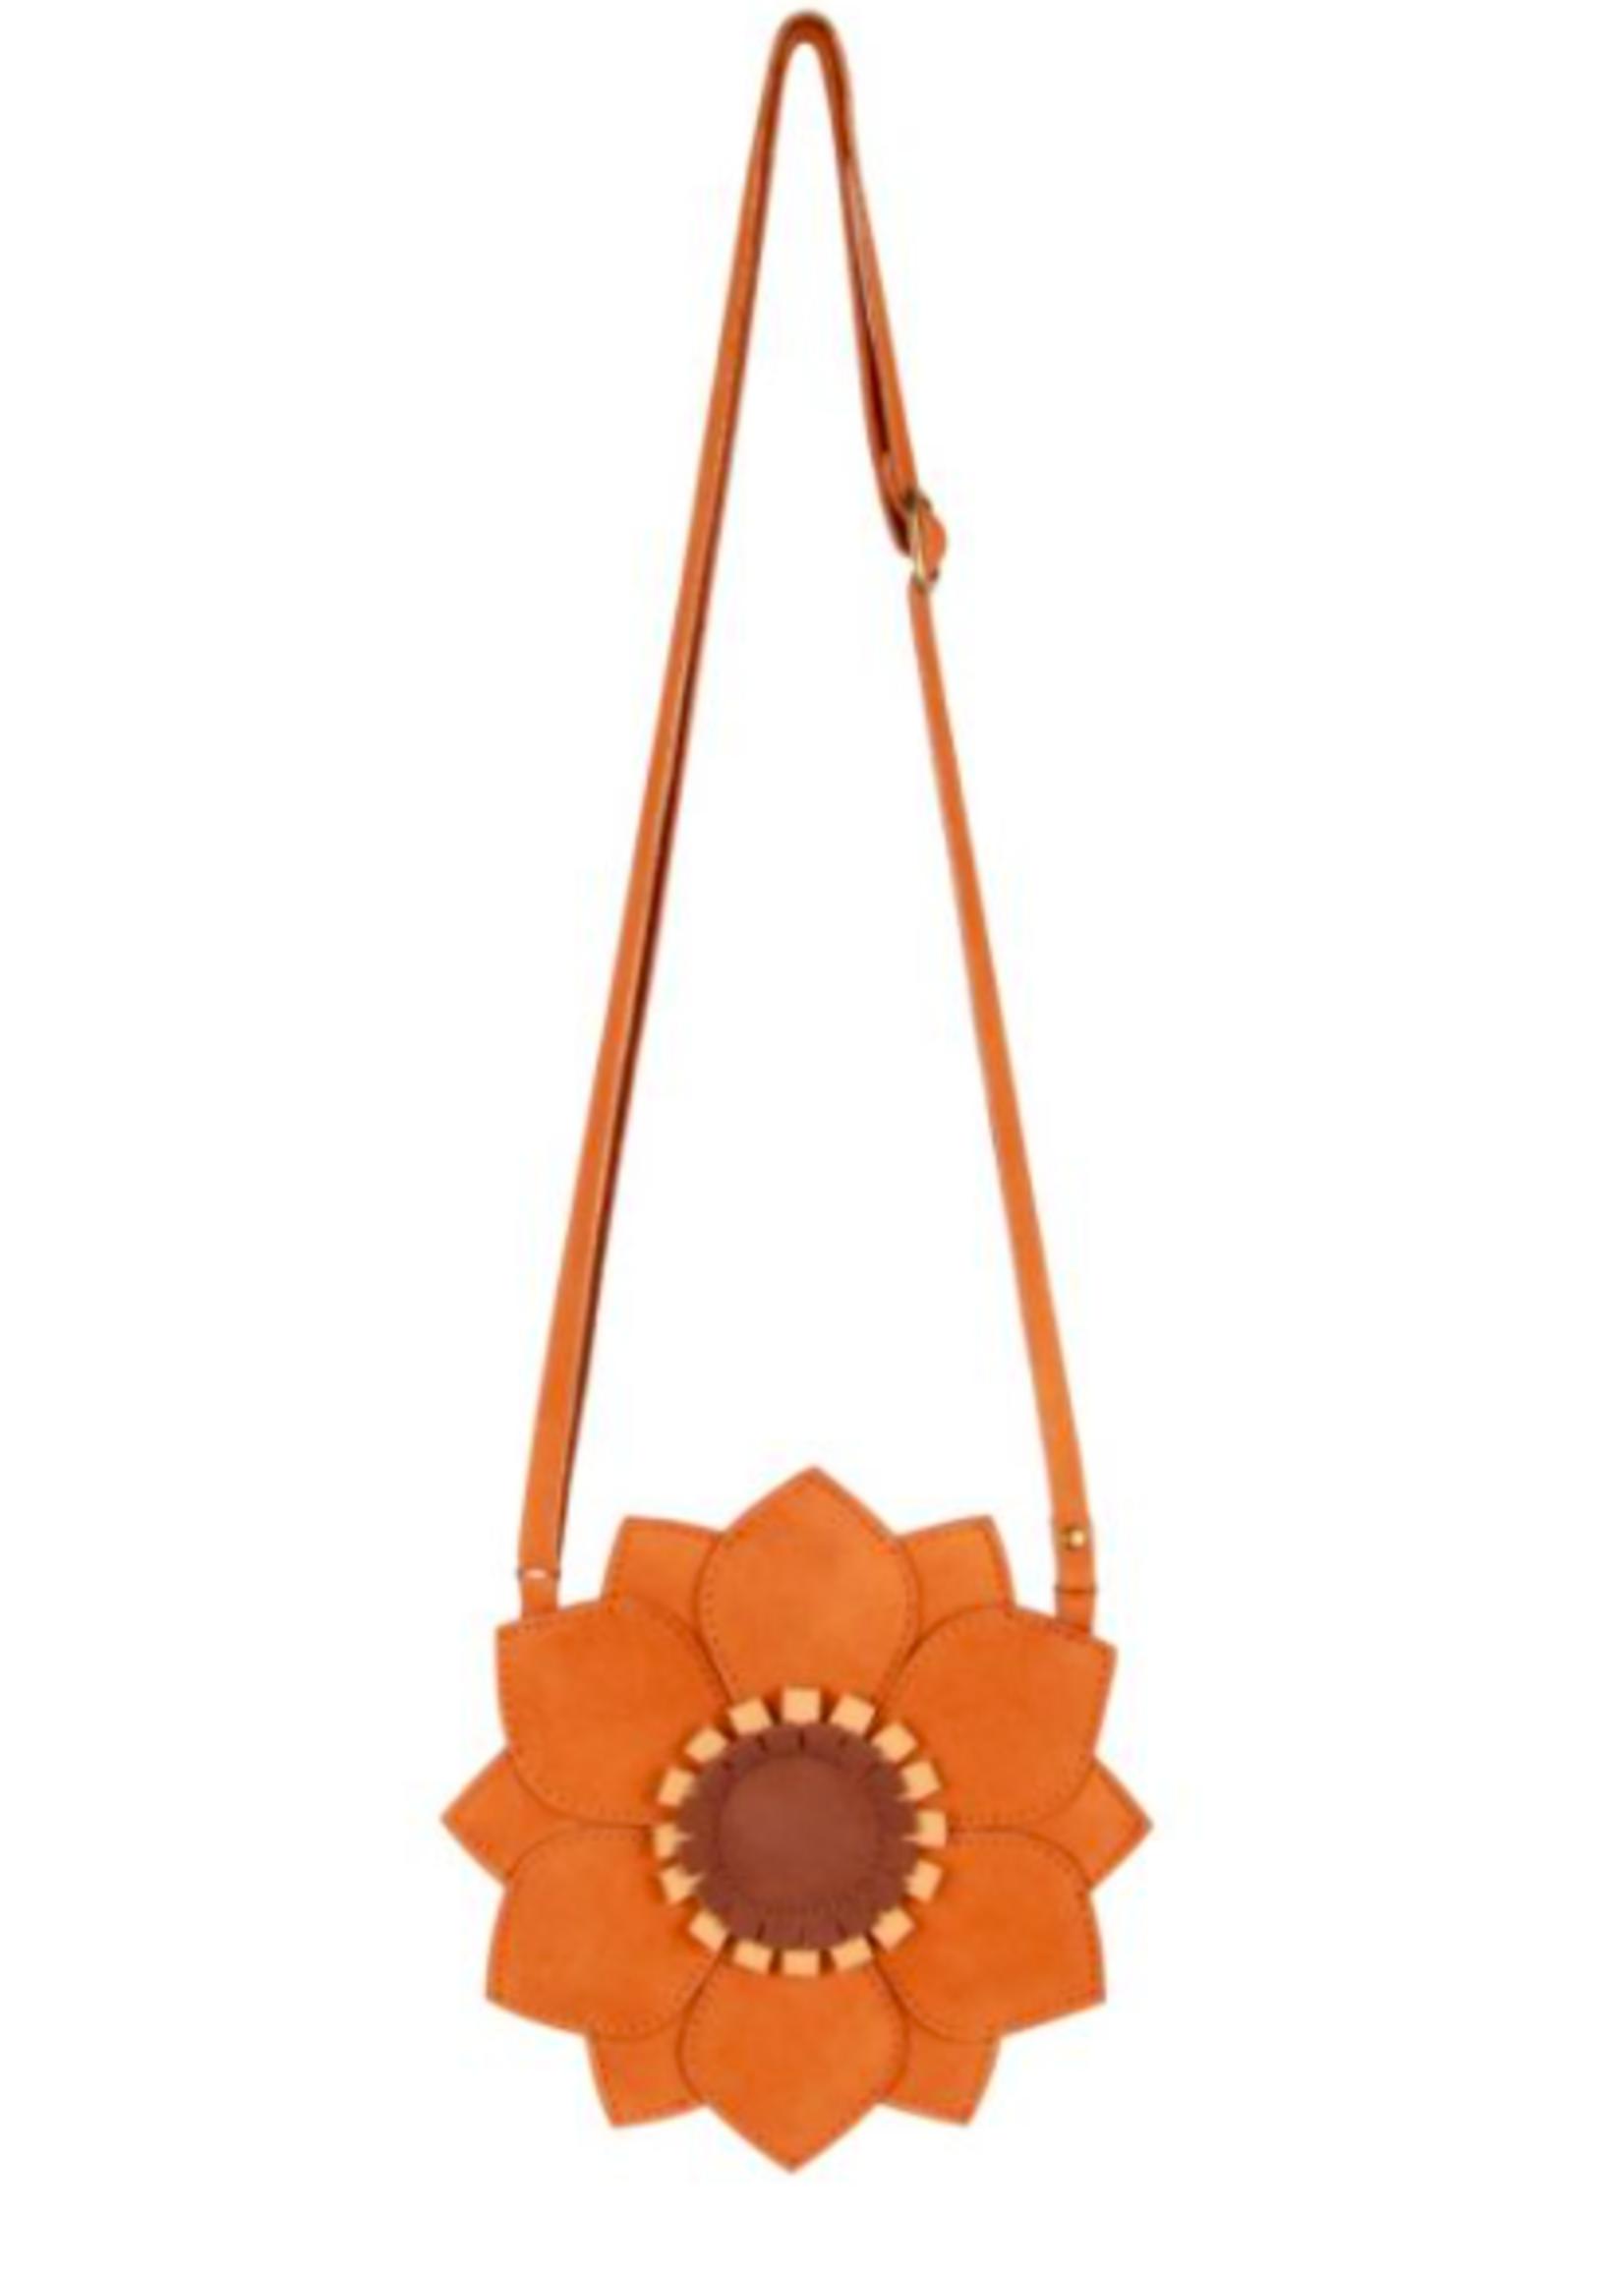 Donsje Amsterdam Toto Purse - Sunflower